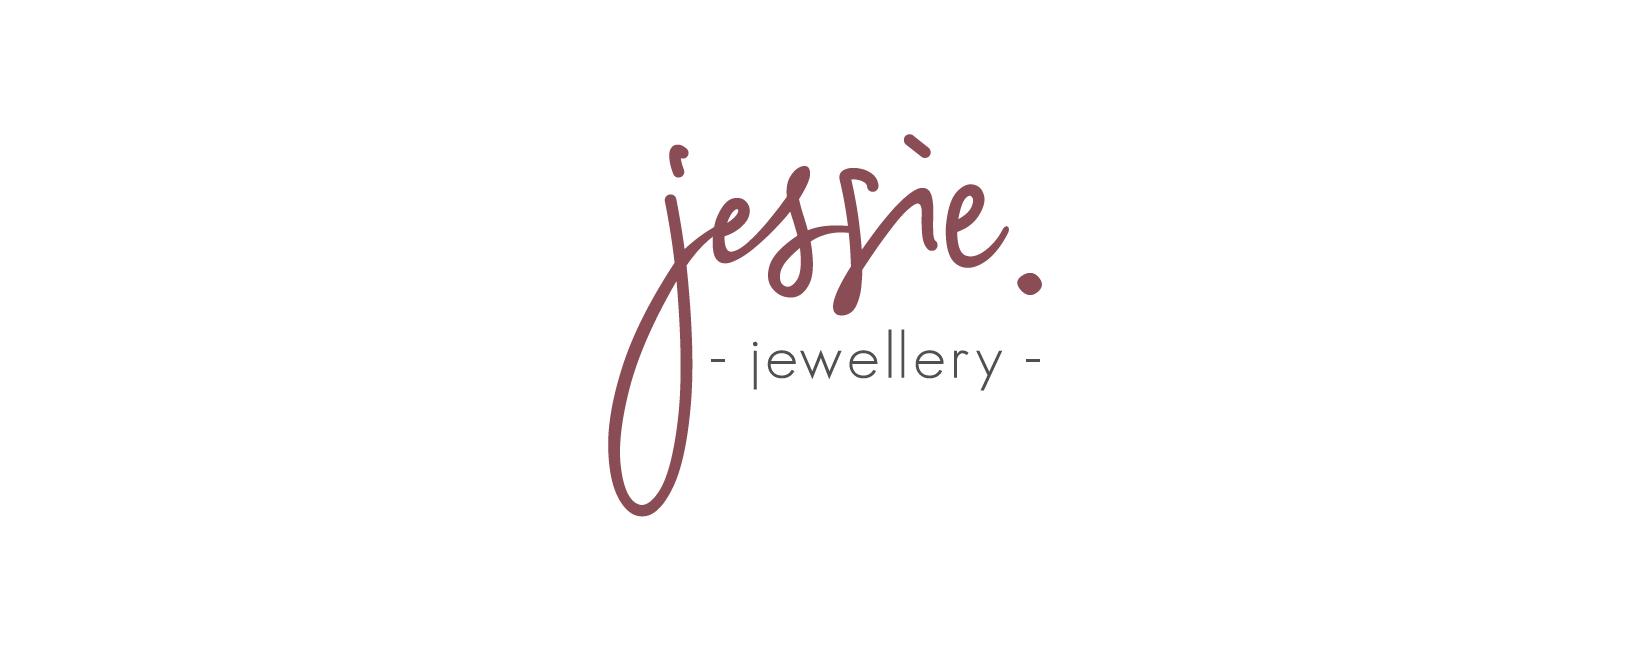 Jessie jewellery logotype principale